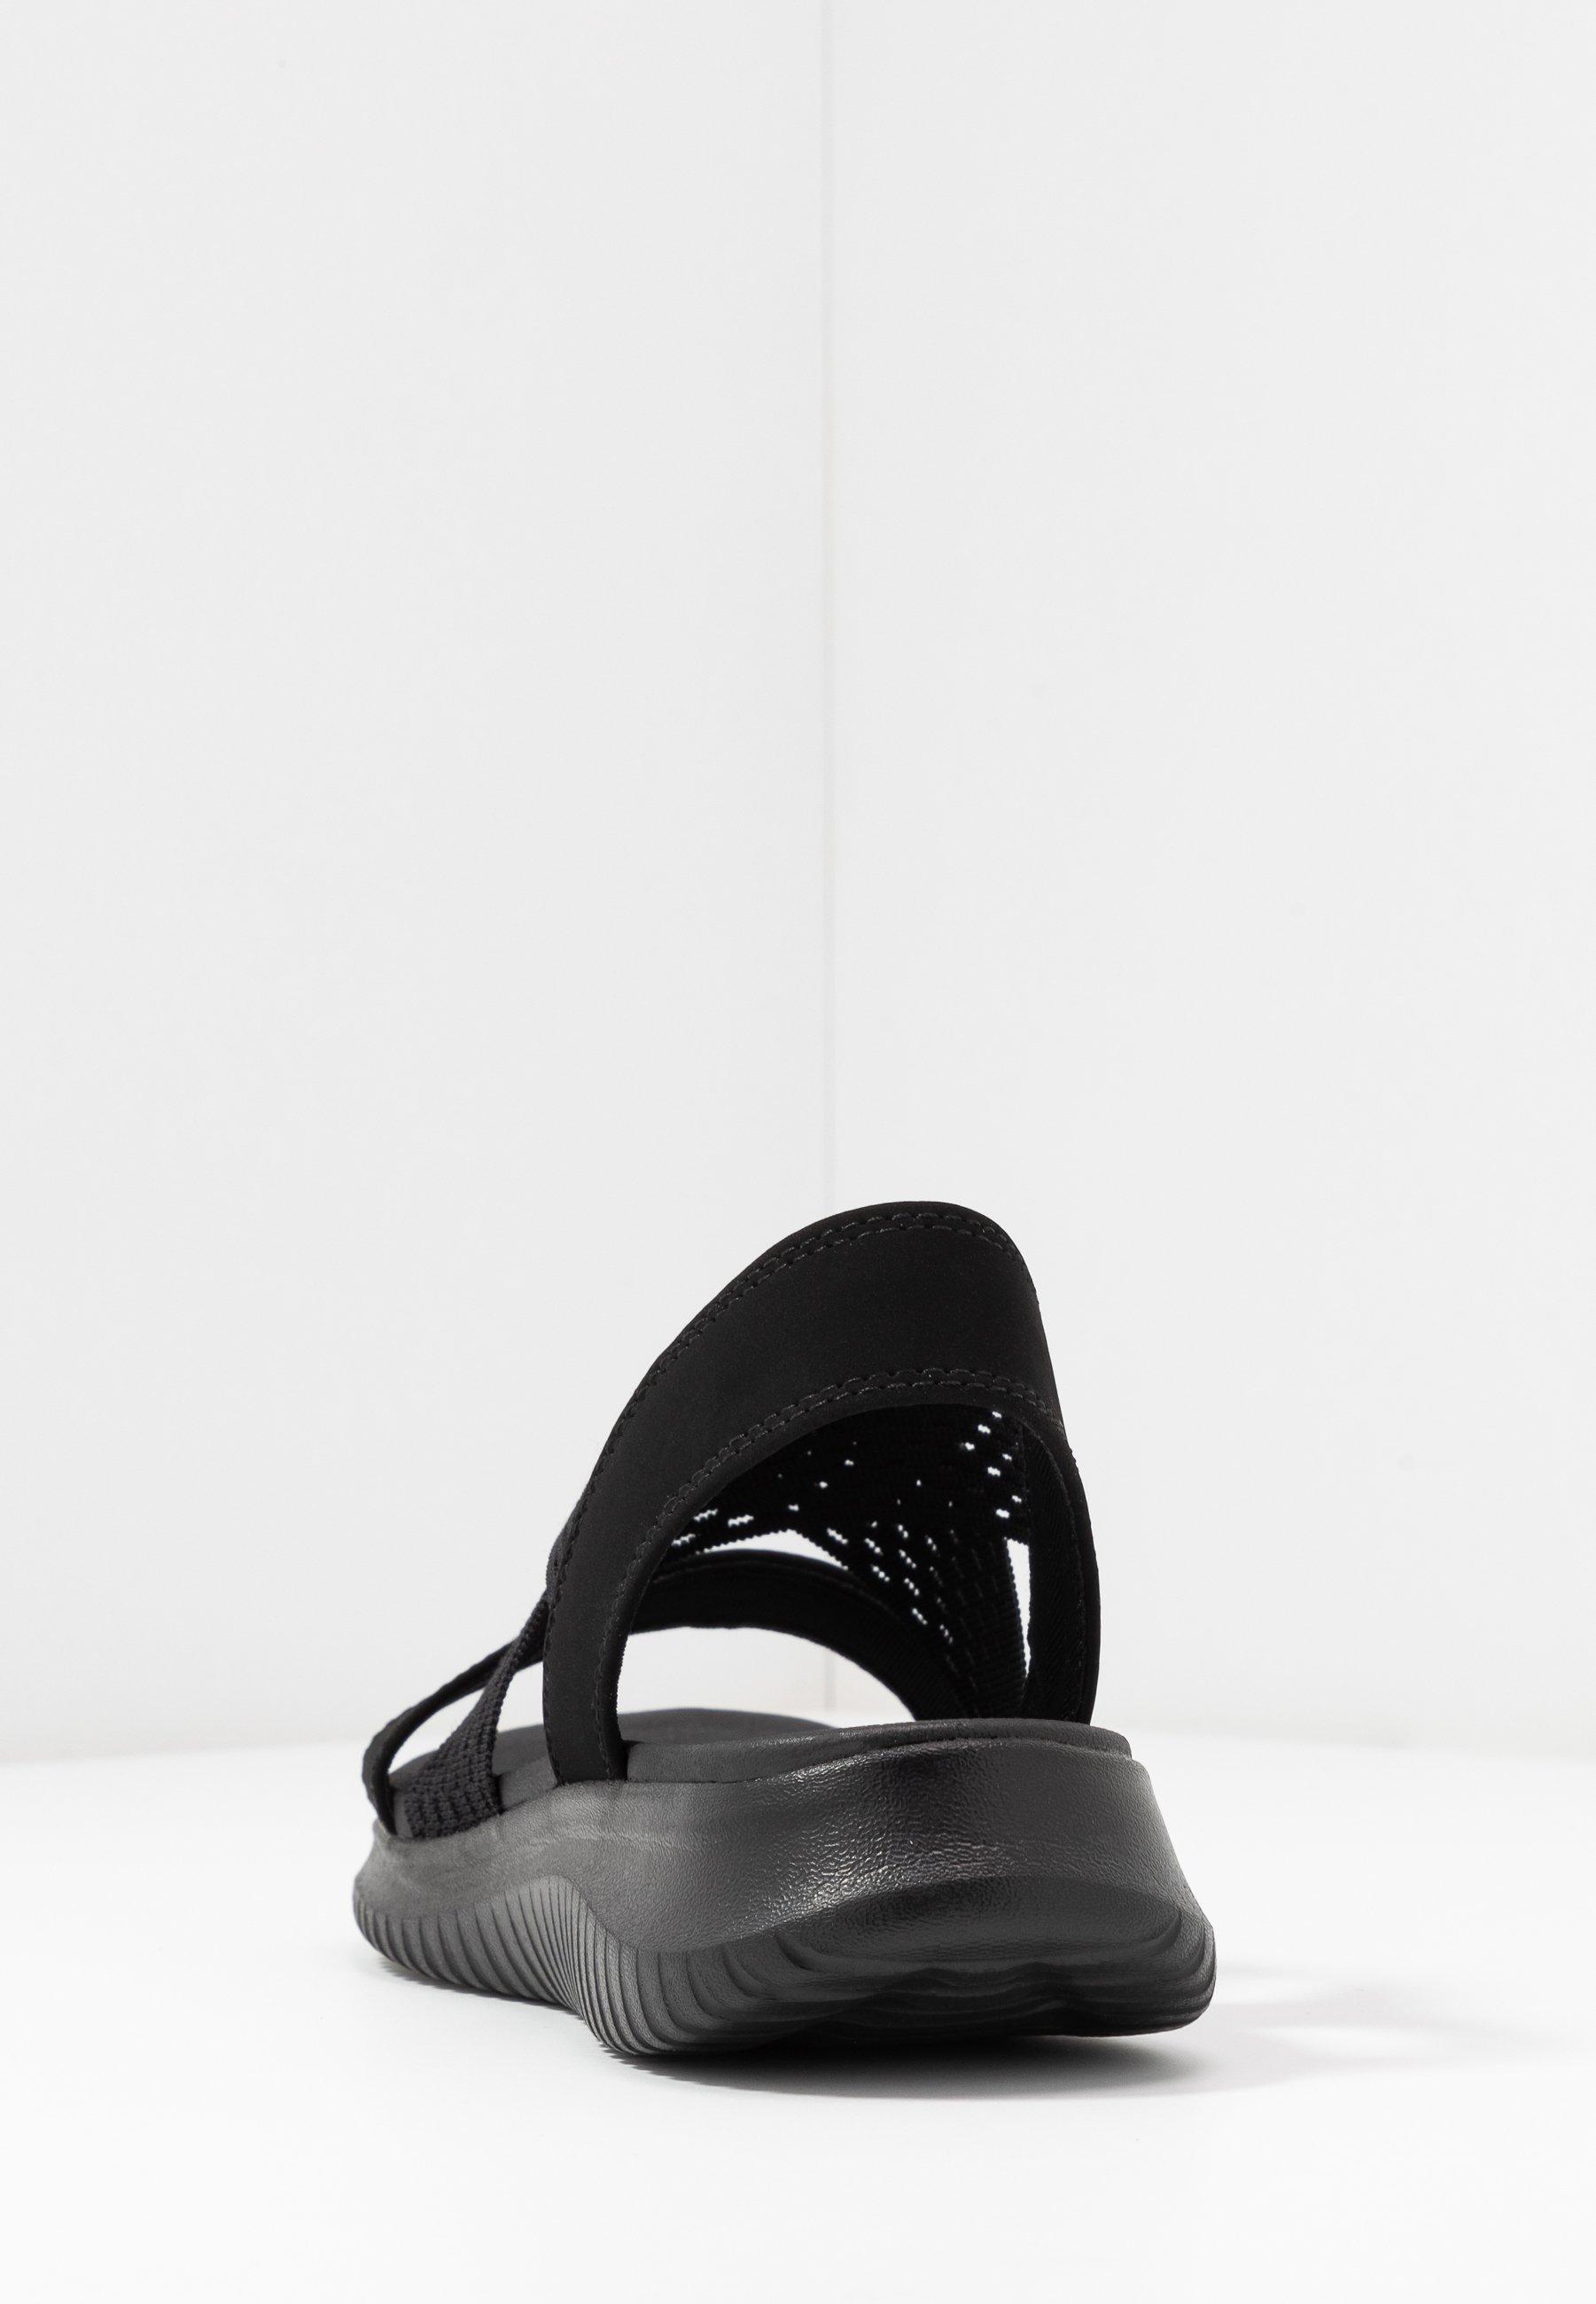 Skechers Ultra Flex - Wedge Sandals Black